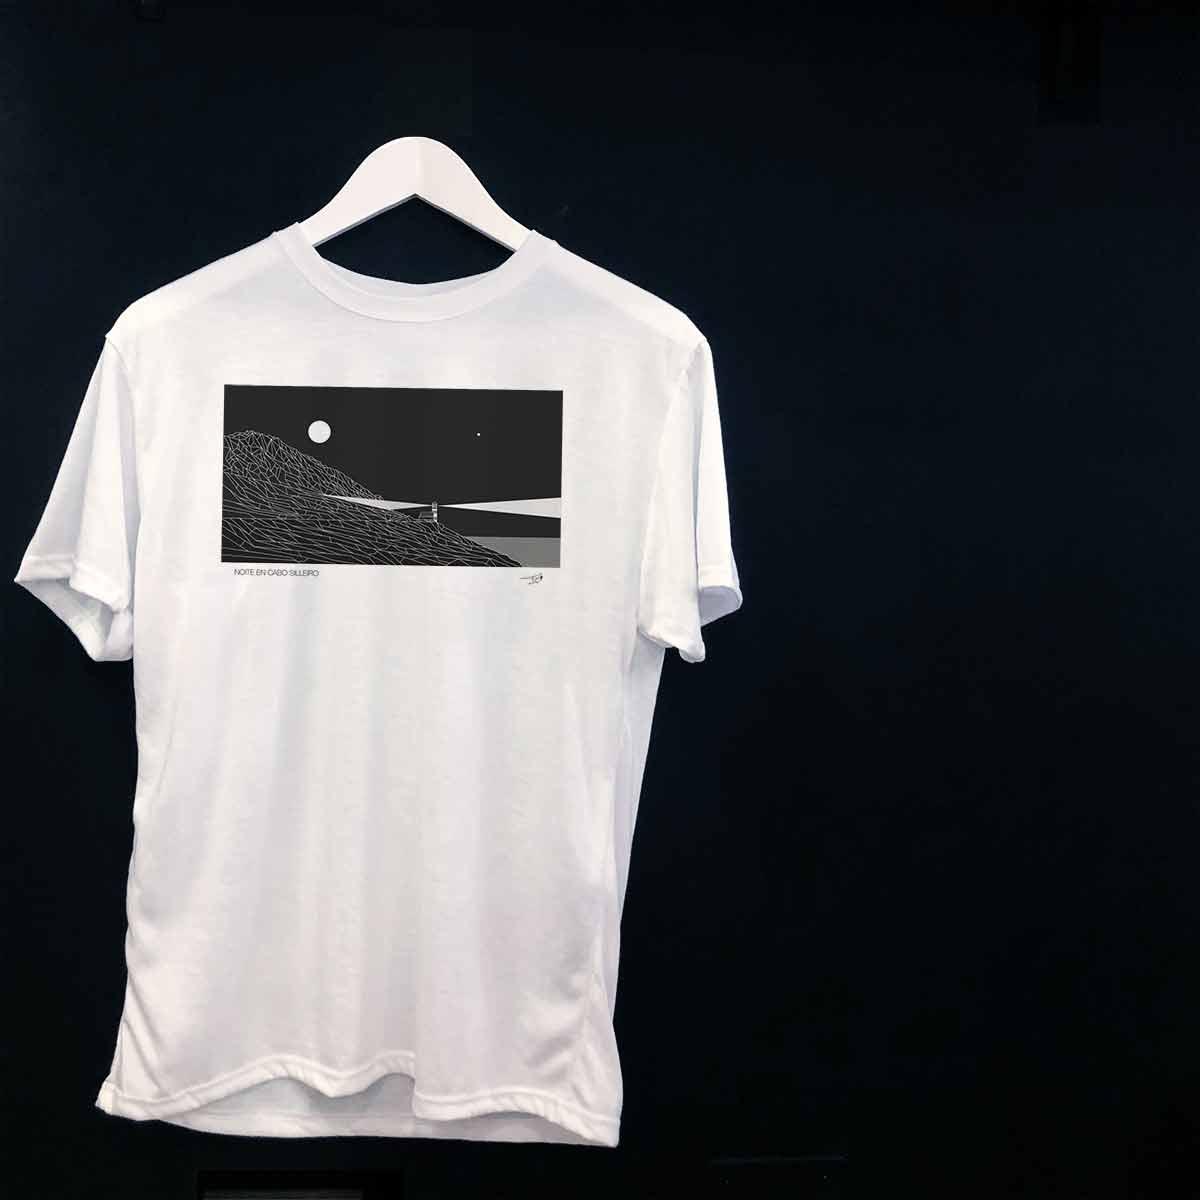 Faro de Cabo Silleiro Oia camisetas baiona camisetas personalizadas tienda souvenirs creativos singulares originales en Baiona Bayprints